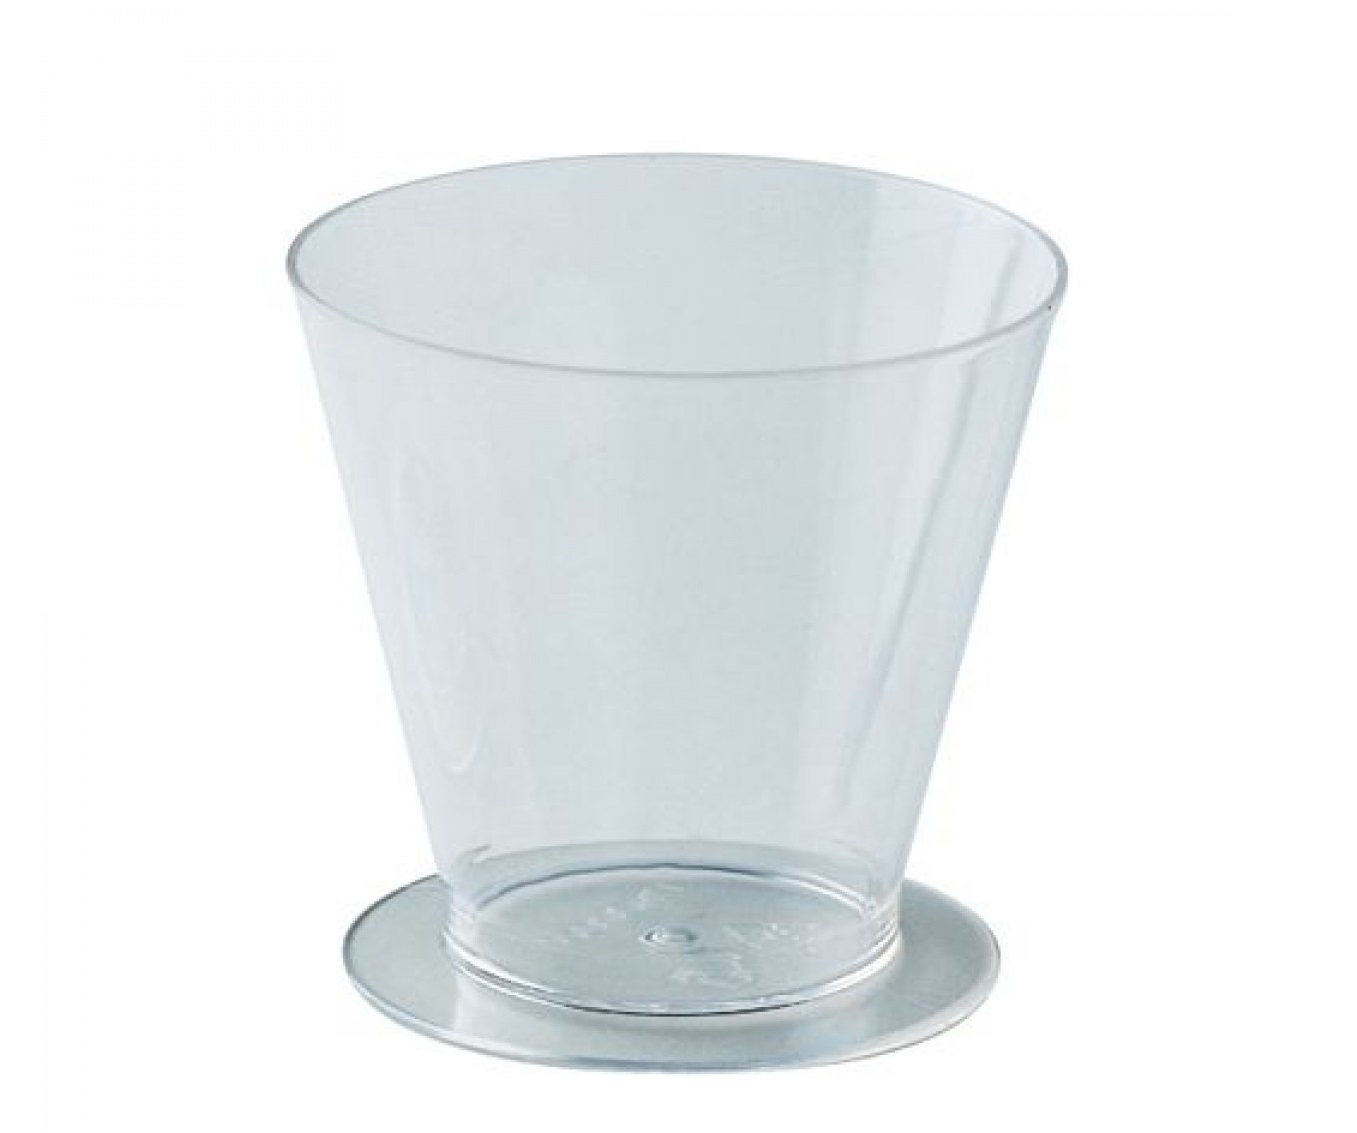 Pahar din plastic rotund 120ml PMOCO002  (100 buc)